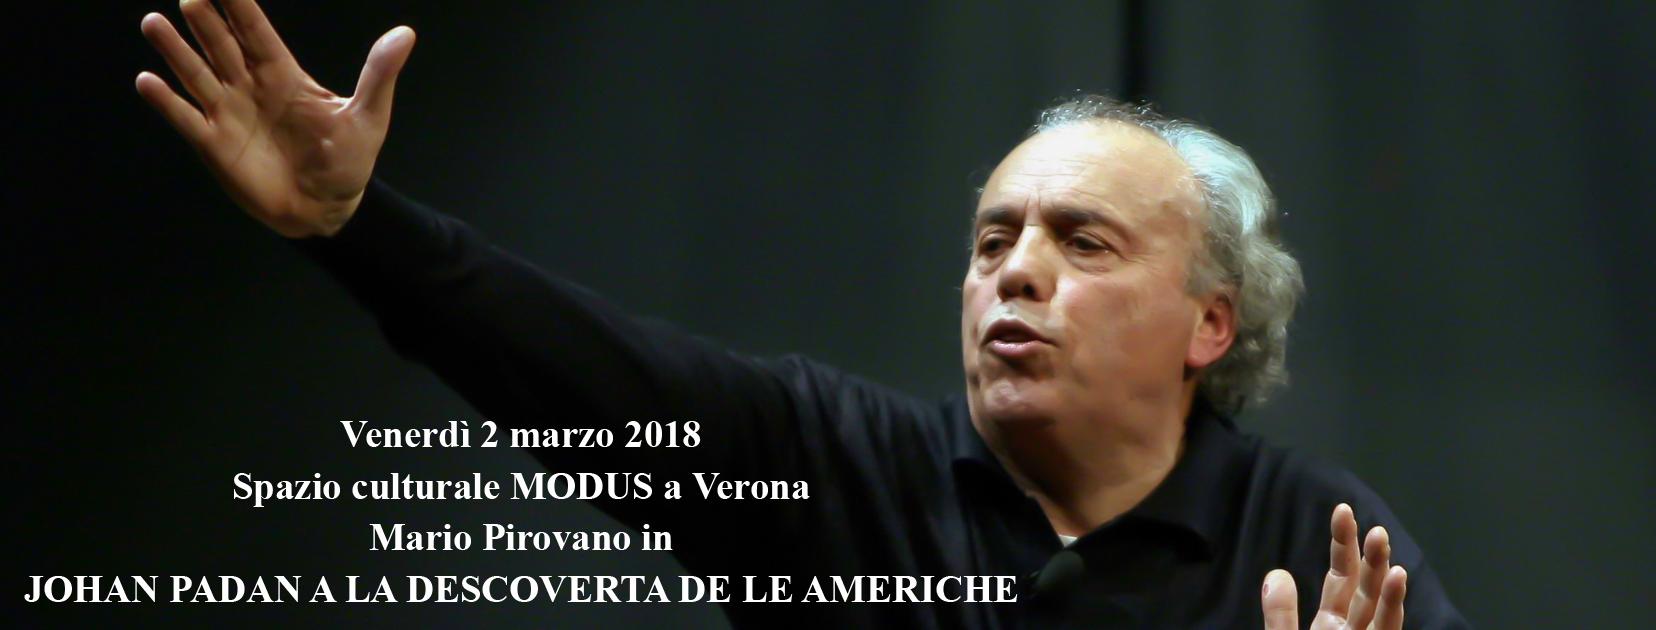 Mario Pirovano Johan Padan Dario Fo Verona